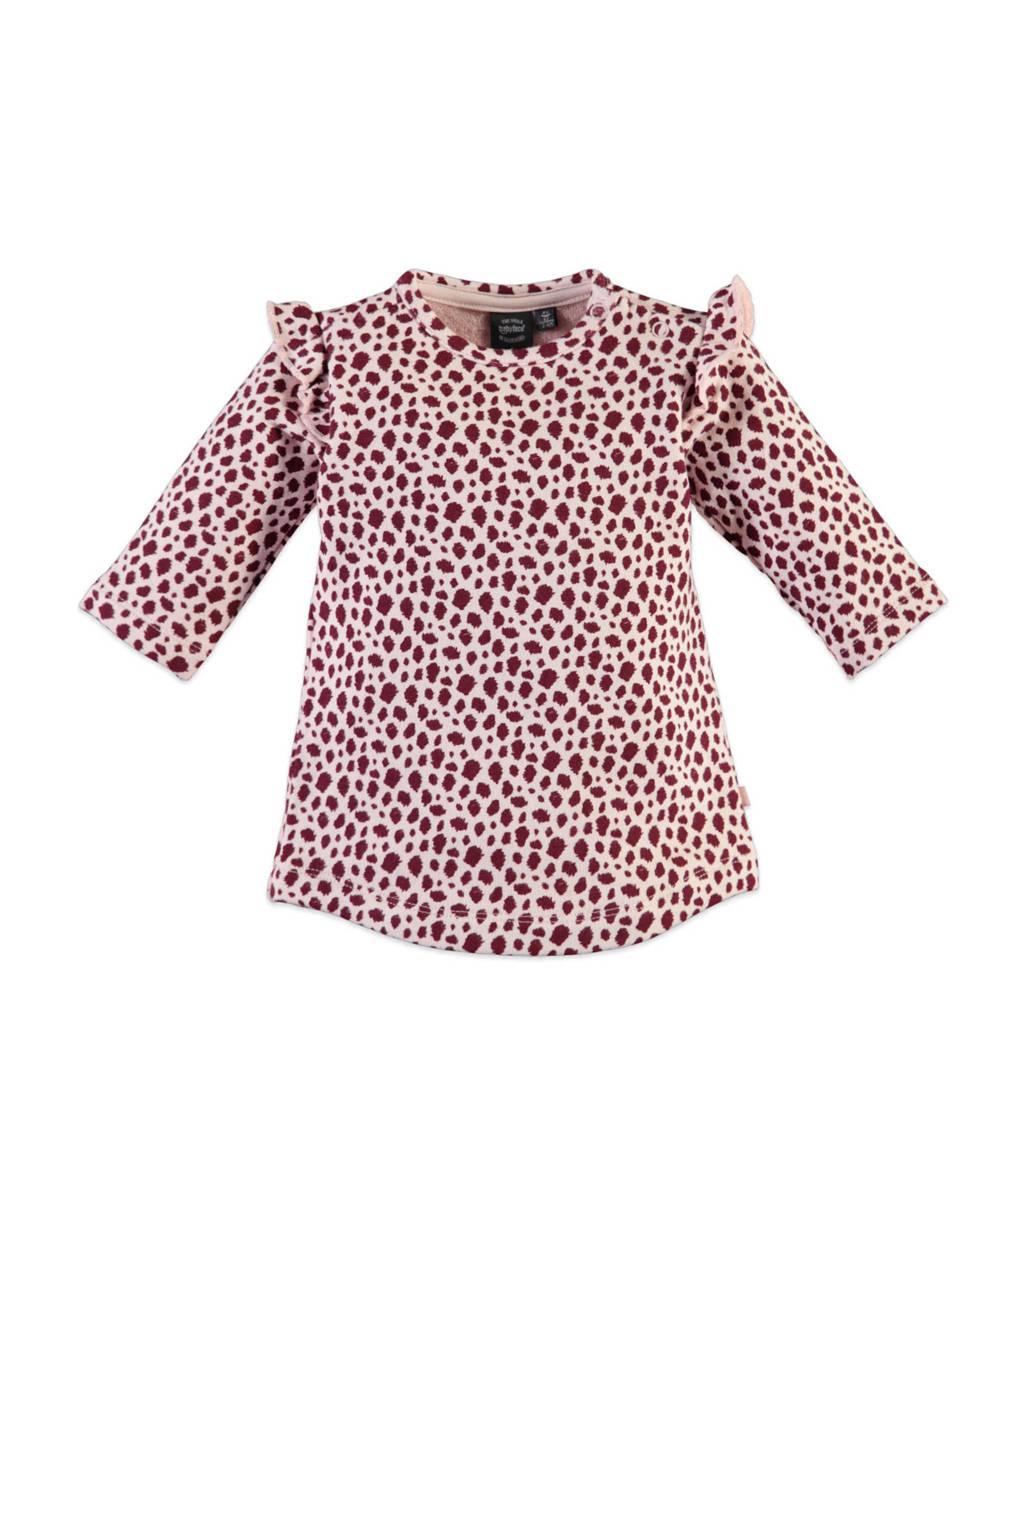 Babyface newborn jurk met all over print en ruches roze, Lichtroze/roze